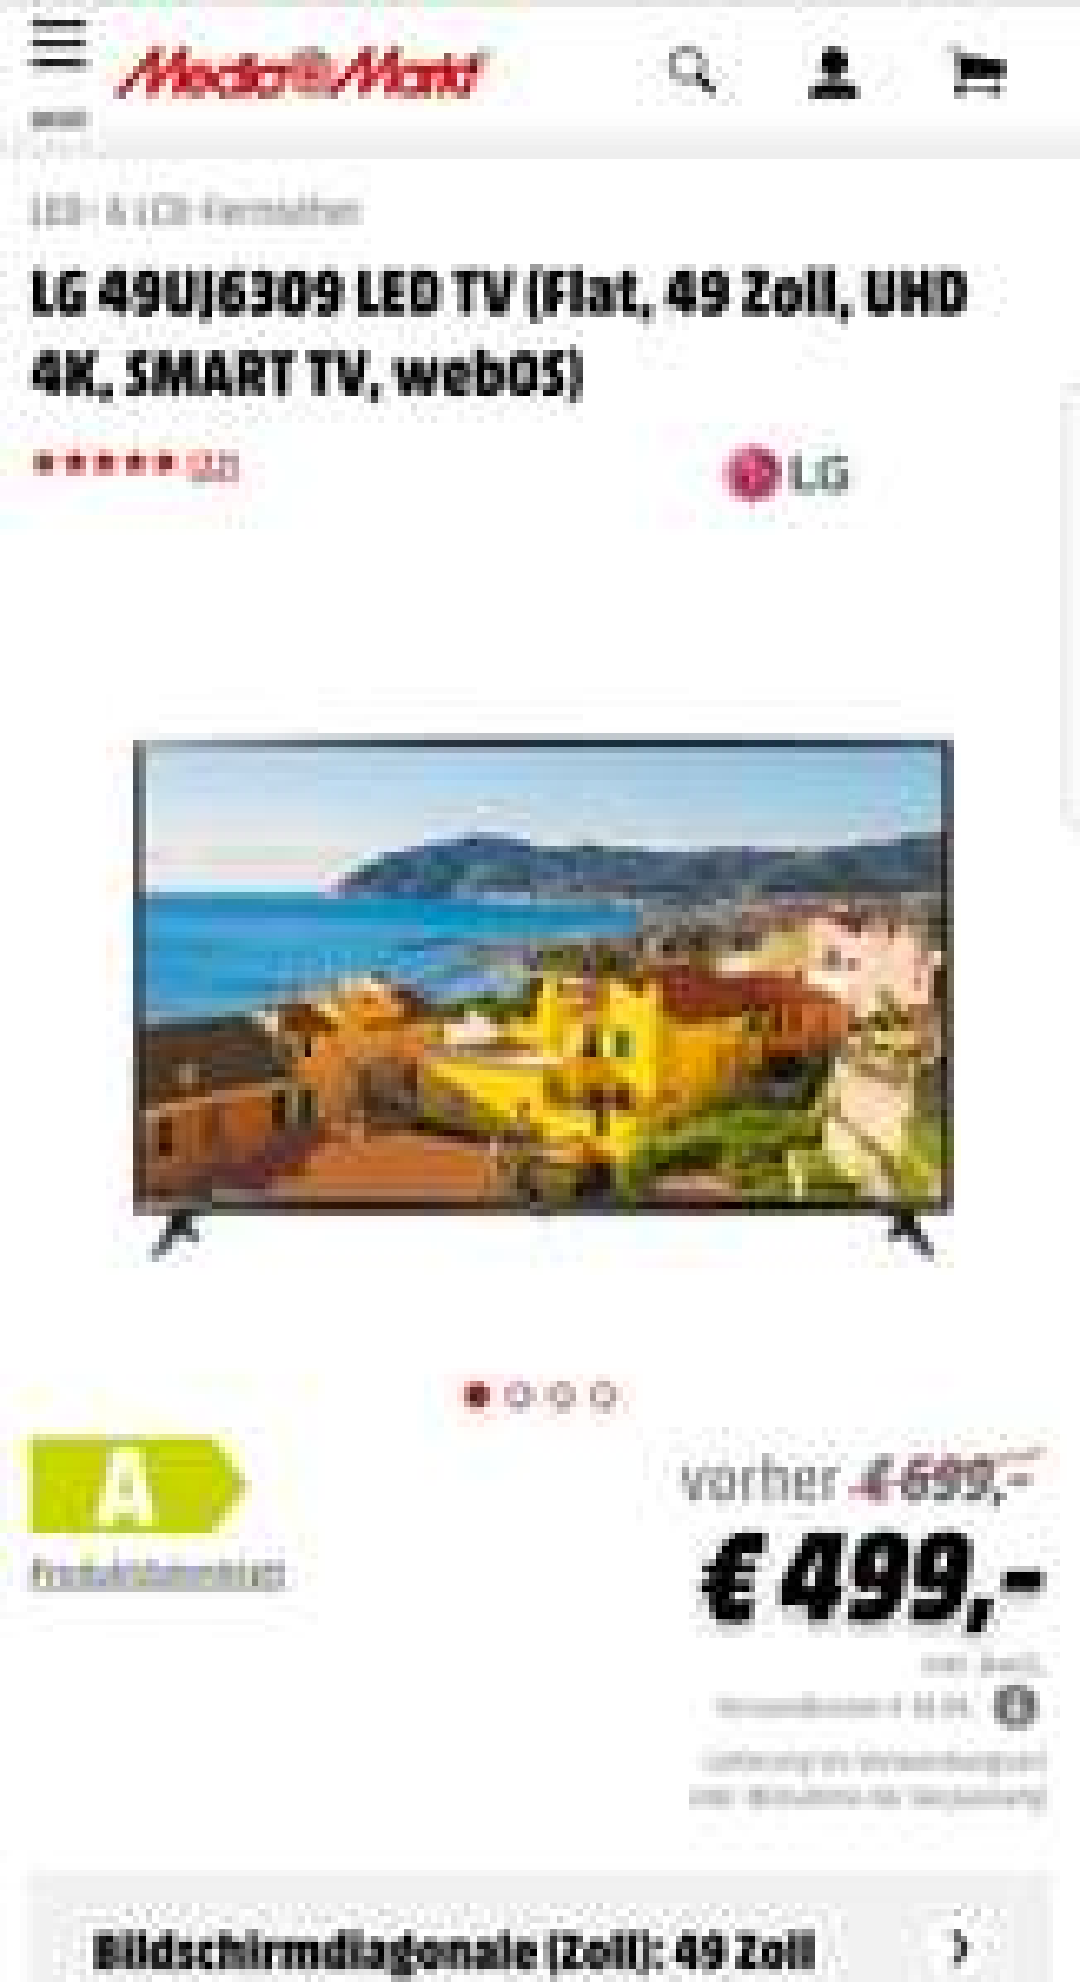 *Media-Markt* LG 49UJ6309 LED TV (Flat, 49 Zoll, UHD 4K, SMART TV, webOS) mit HDR10 (8-Bit +FCR) und sehr niedrigem Input-Lag